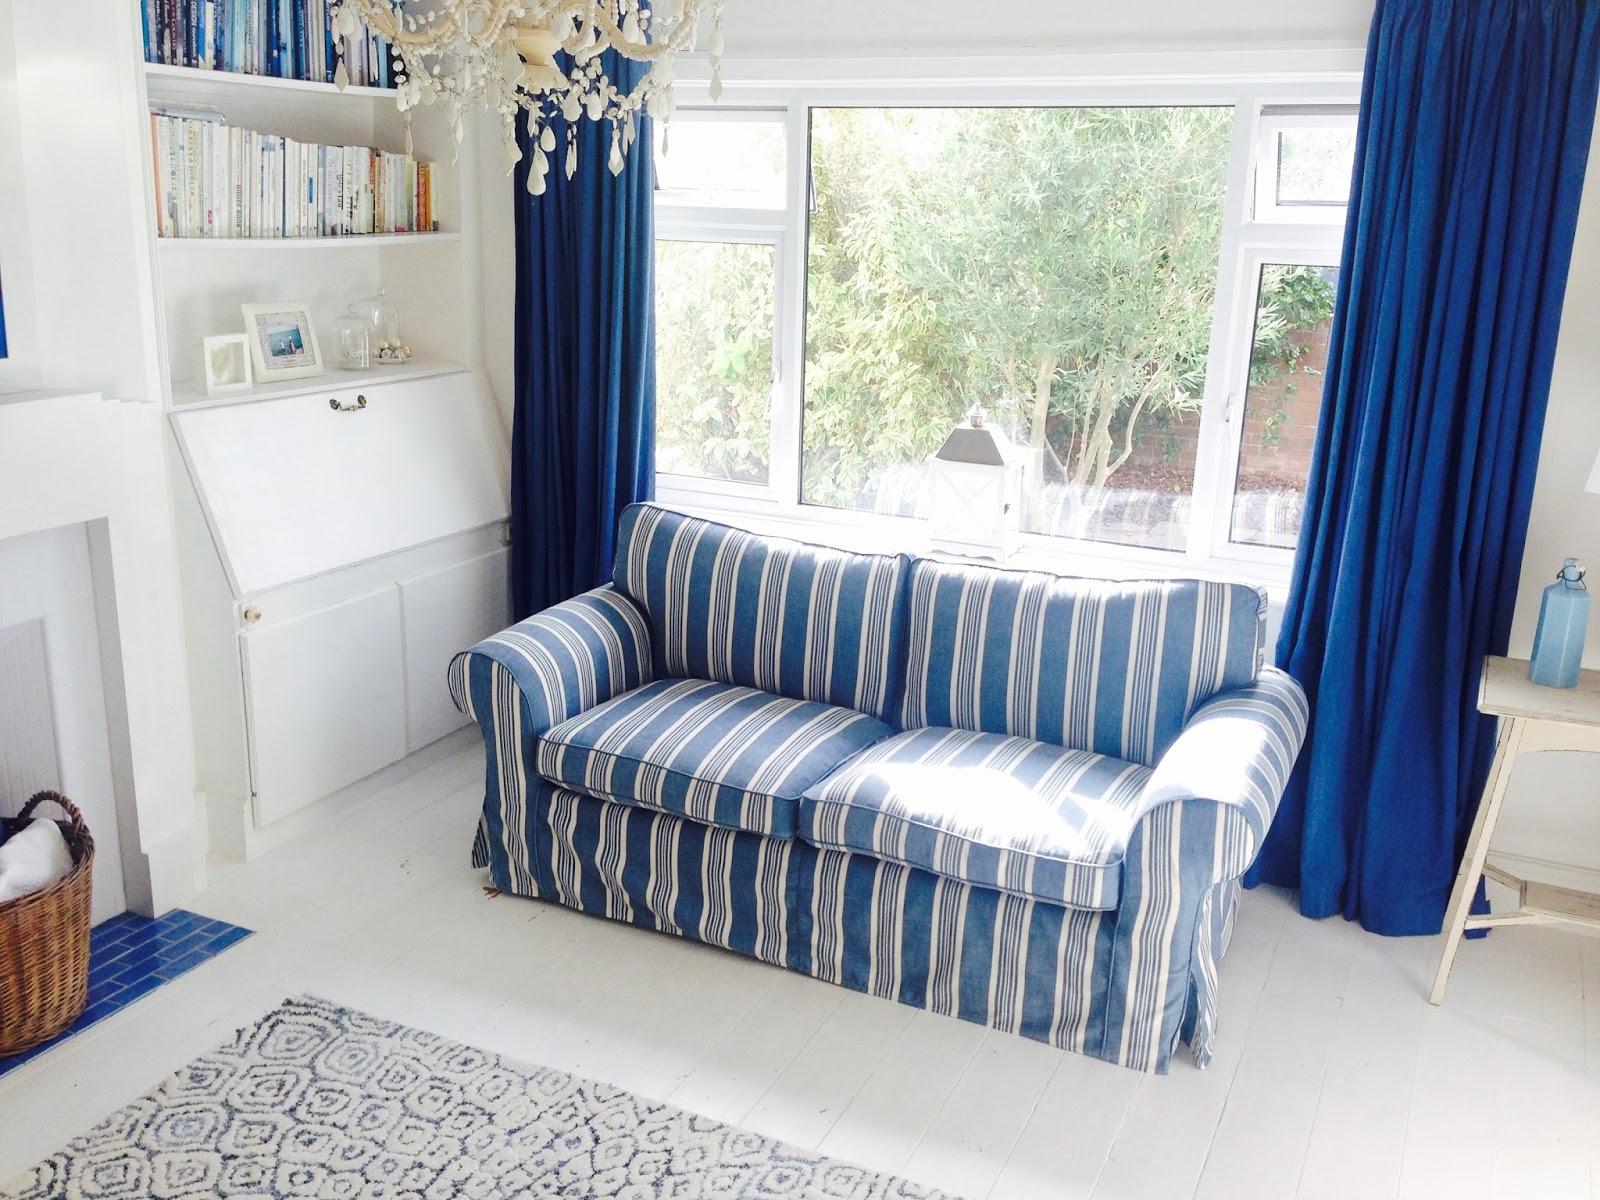 The Perfect Sofa!